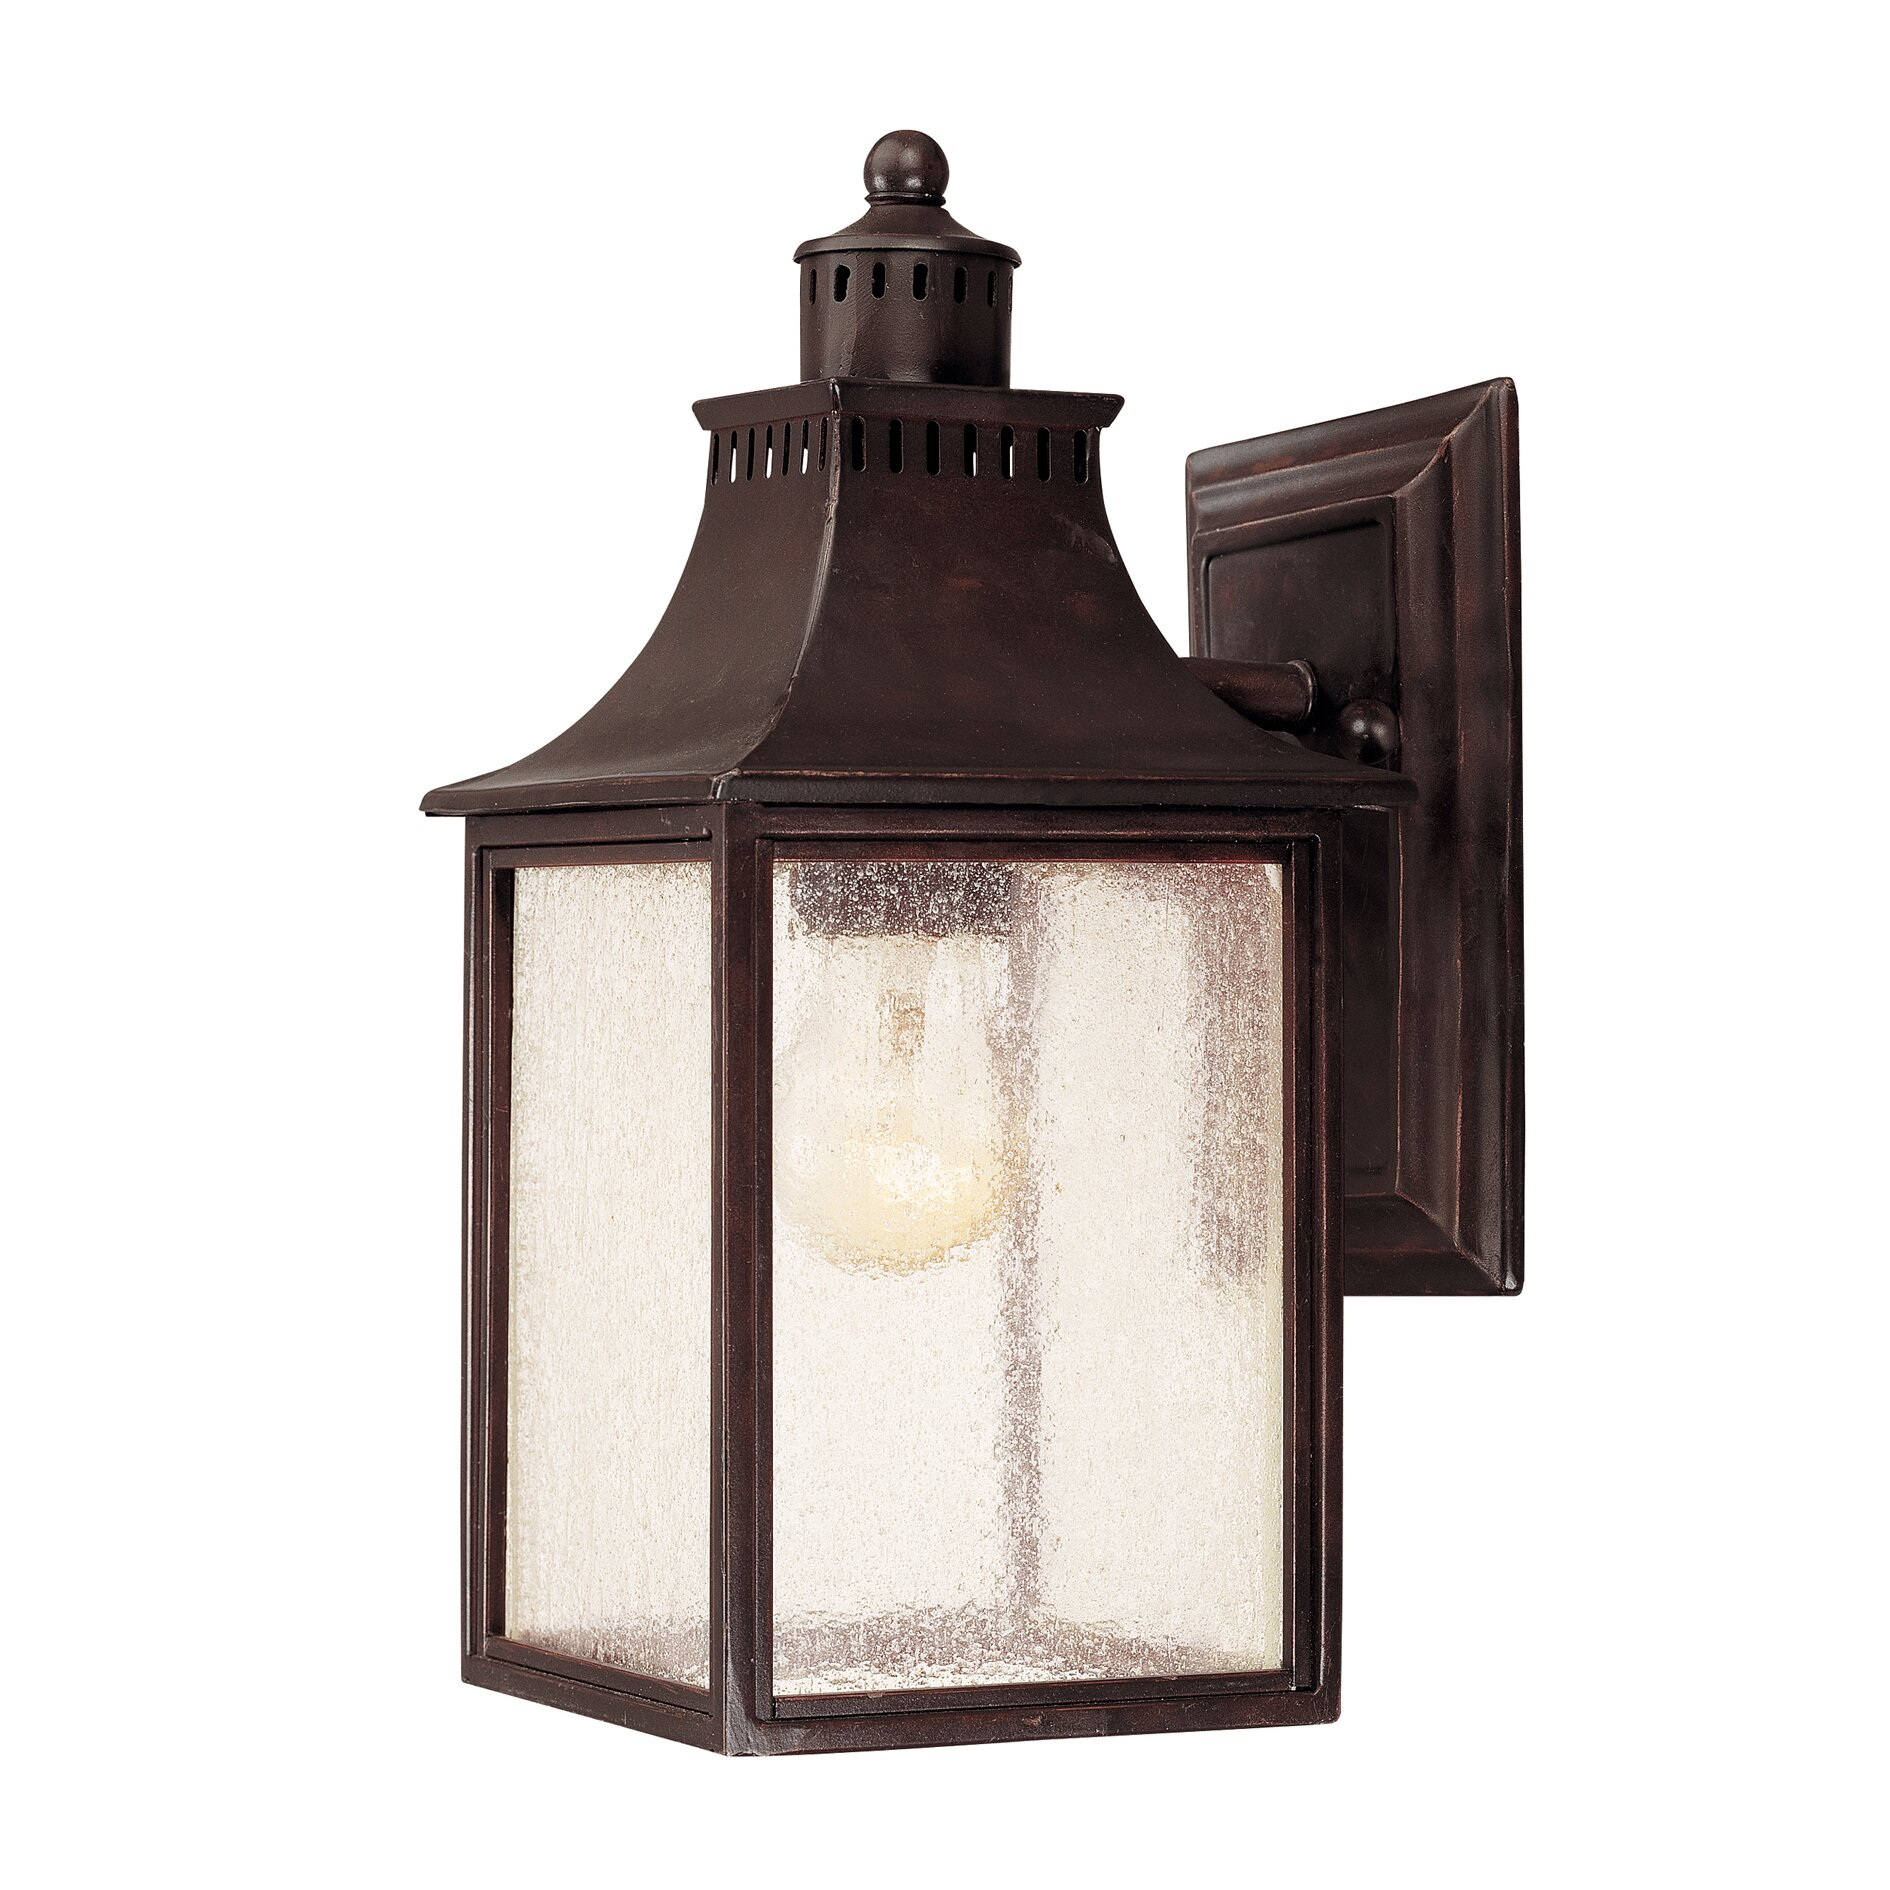 Savoy house monte grande 1 light outdoor wall lantern for Savoy house